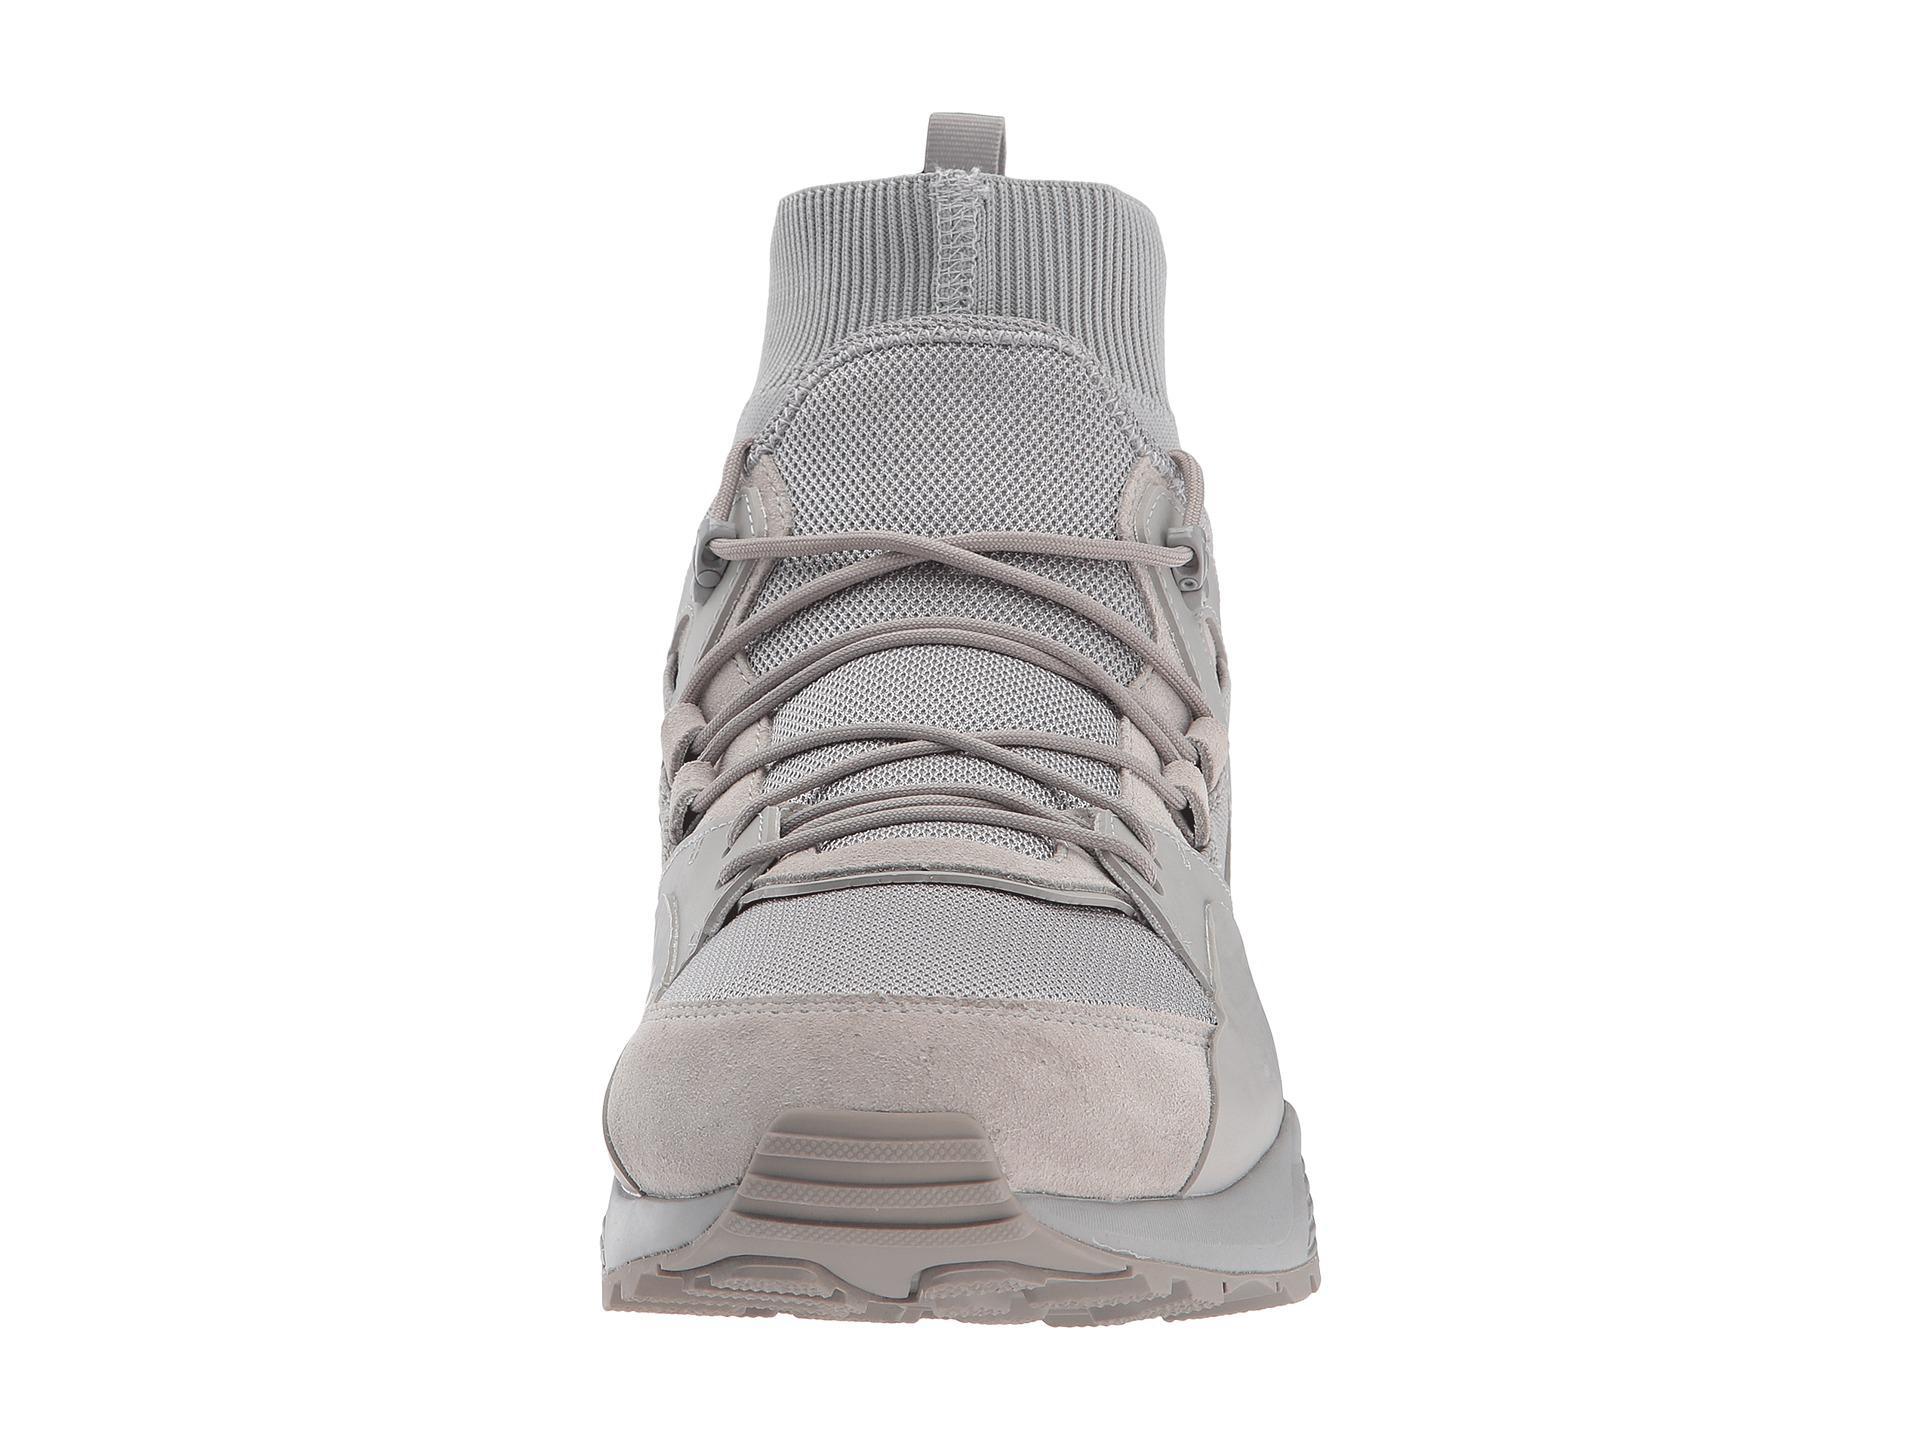 e48002d5f84c94 Lyst - PUMA X Han Kjobenhavn B.o.g. Sock Sneaker in Gray for Men